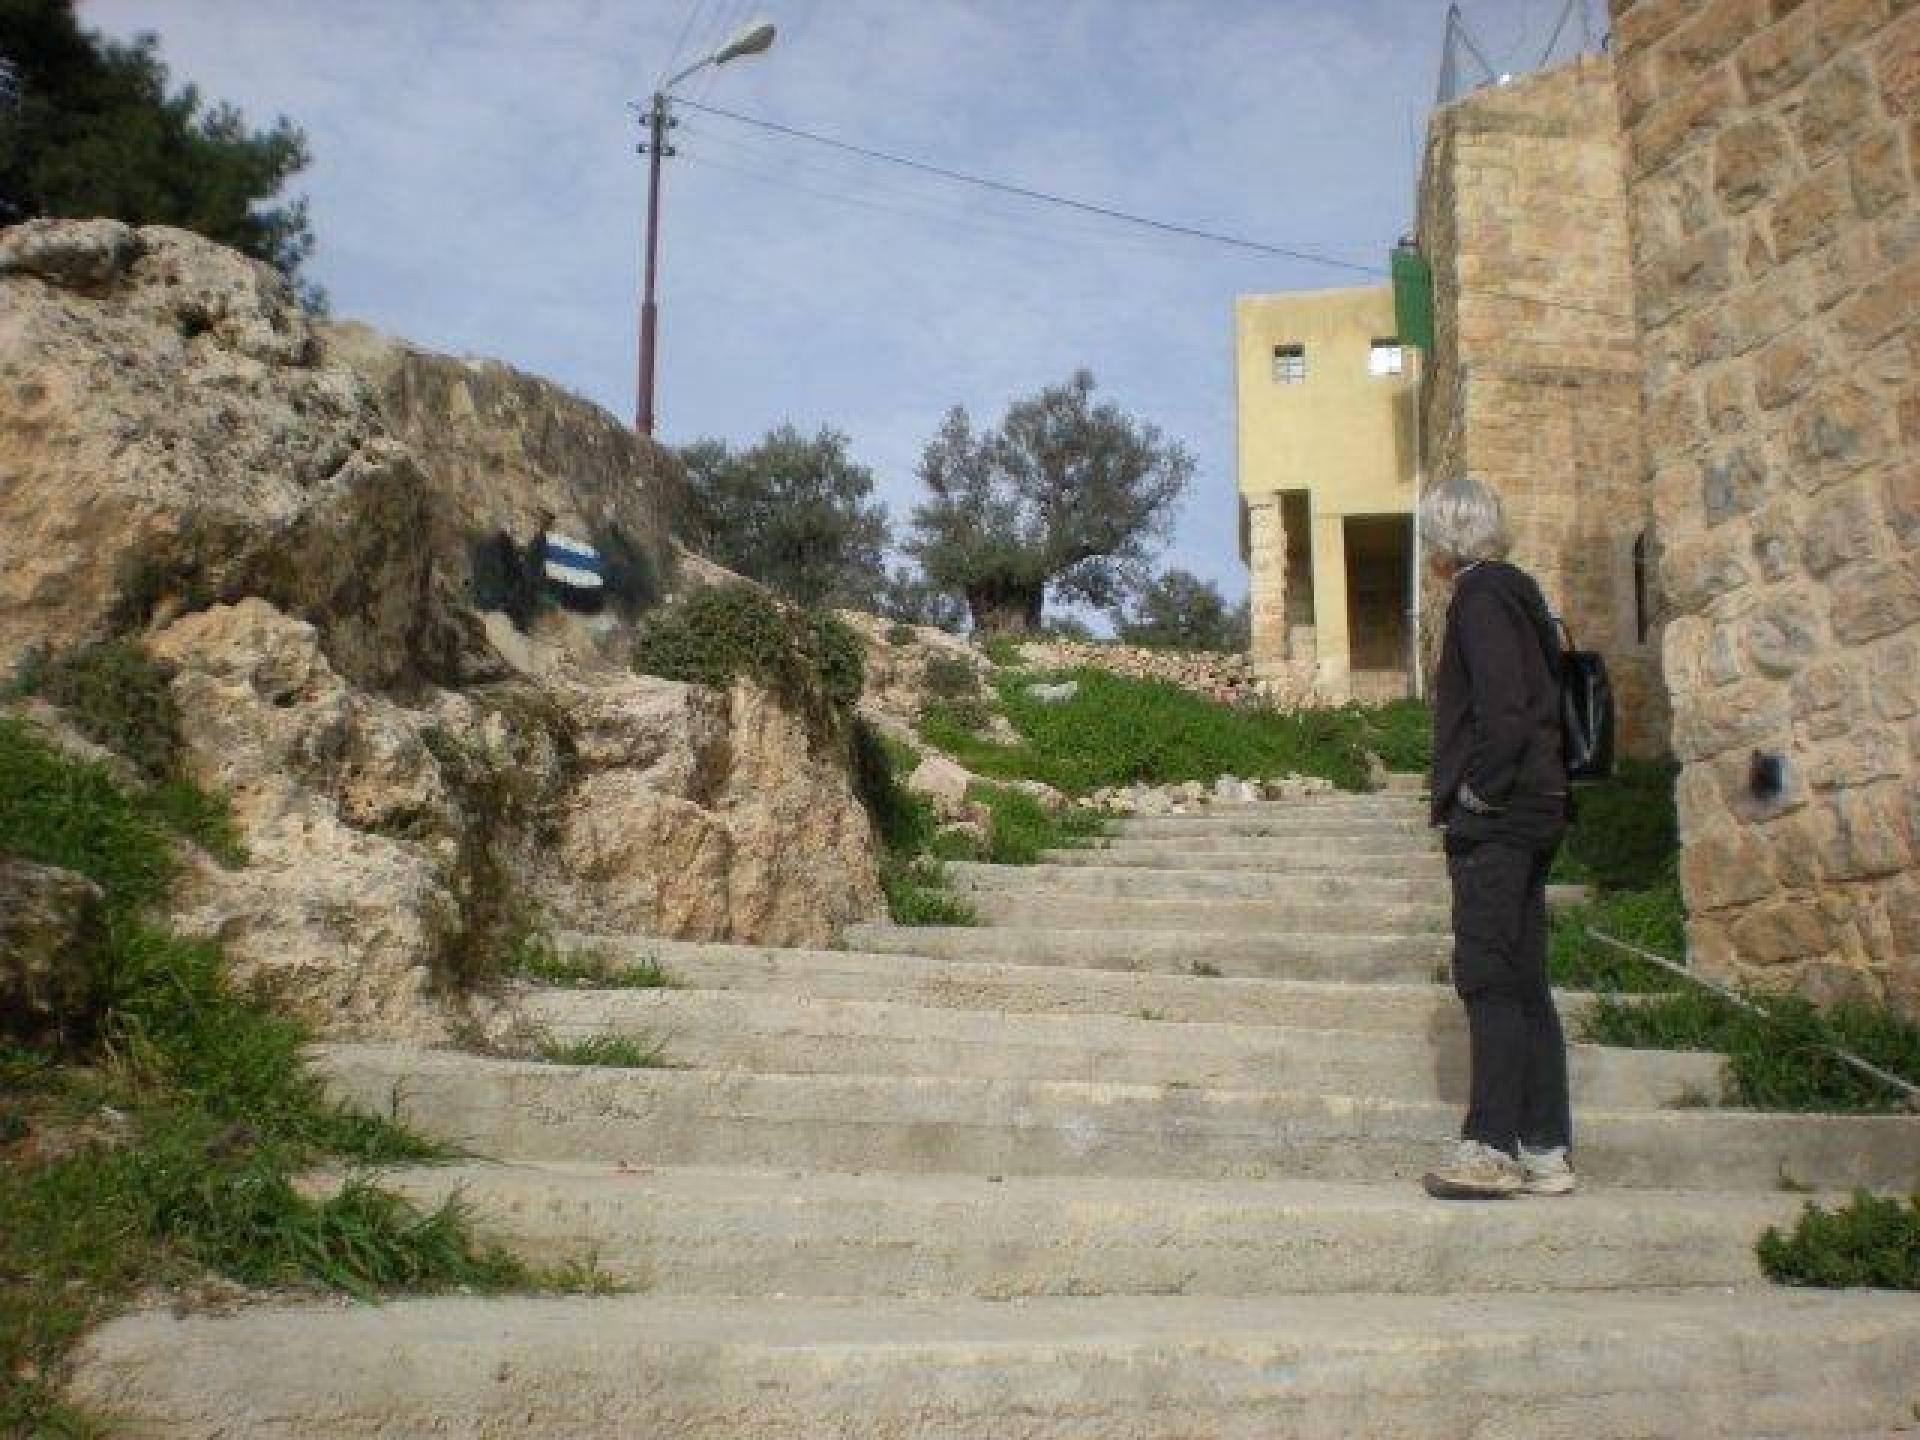 Hebron 11.03.12